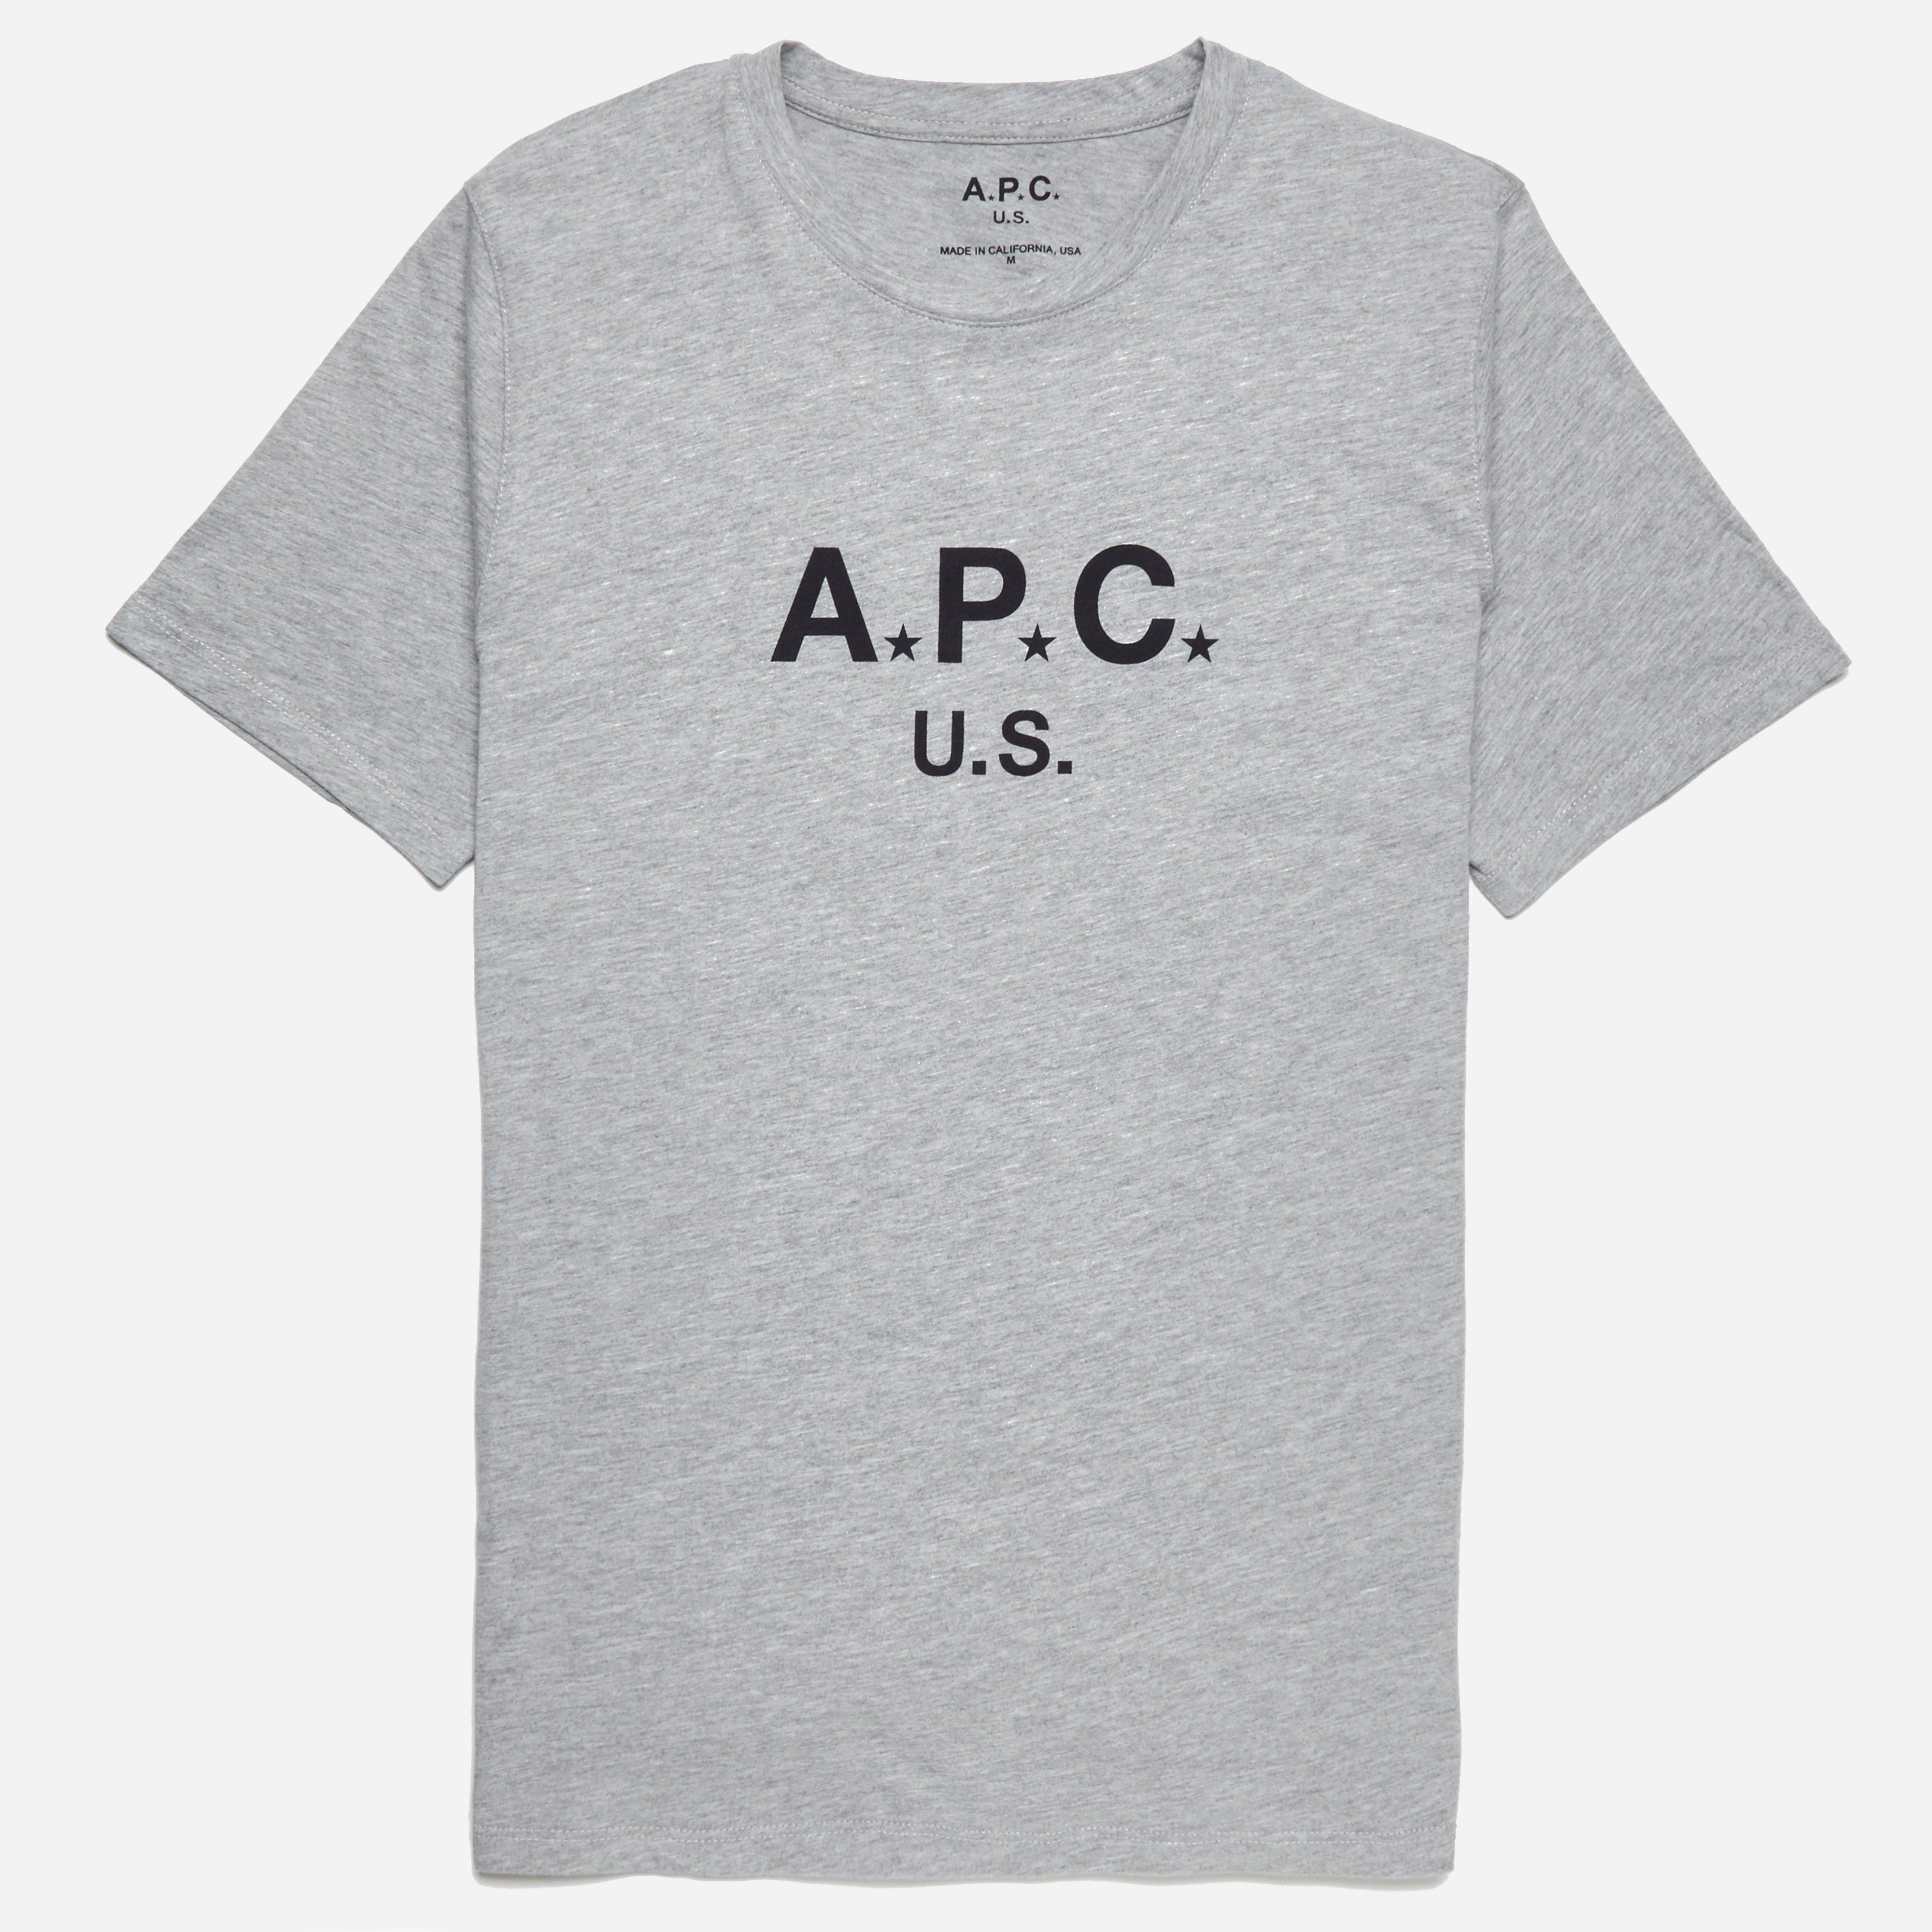 A.P.C U.S T-shirt